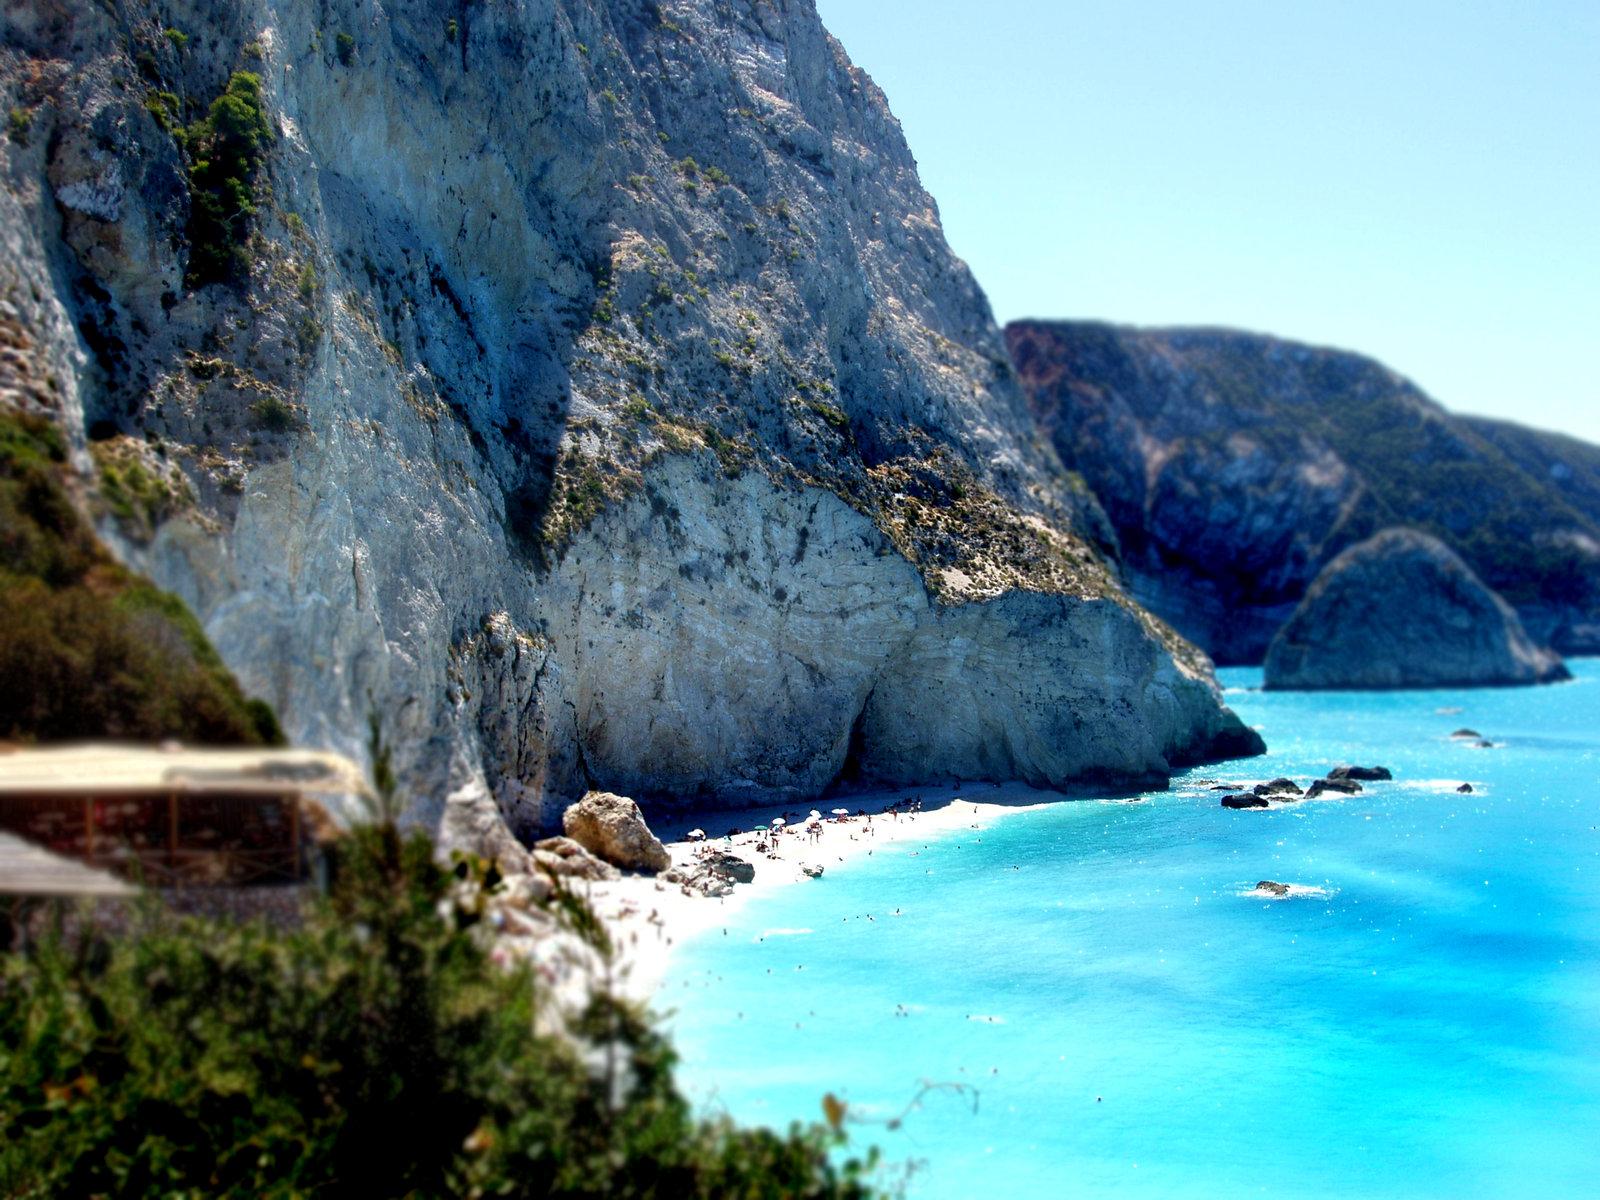 lefkada___porto_katsiki_beach_by_bef0rmylifefellapart.jpg